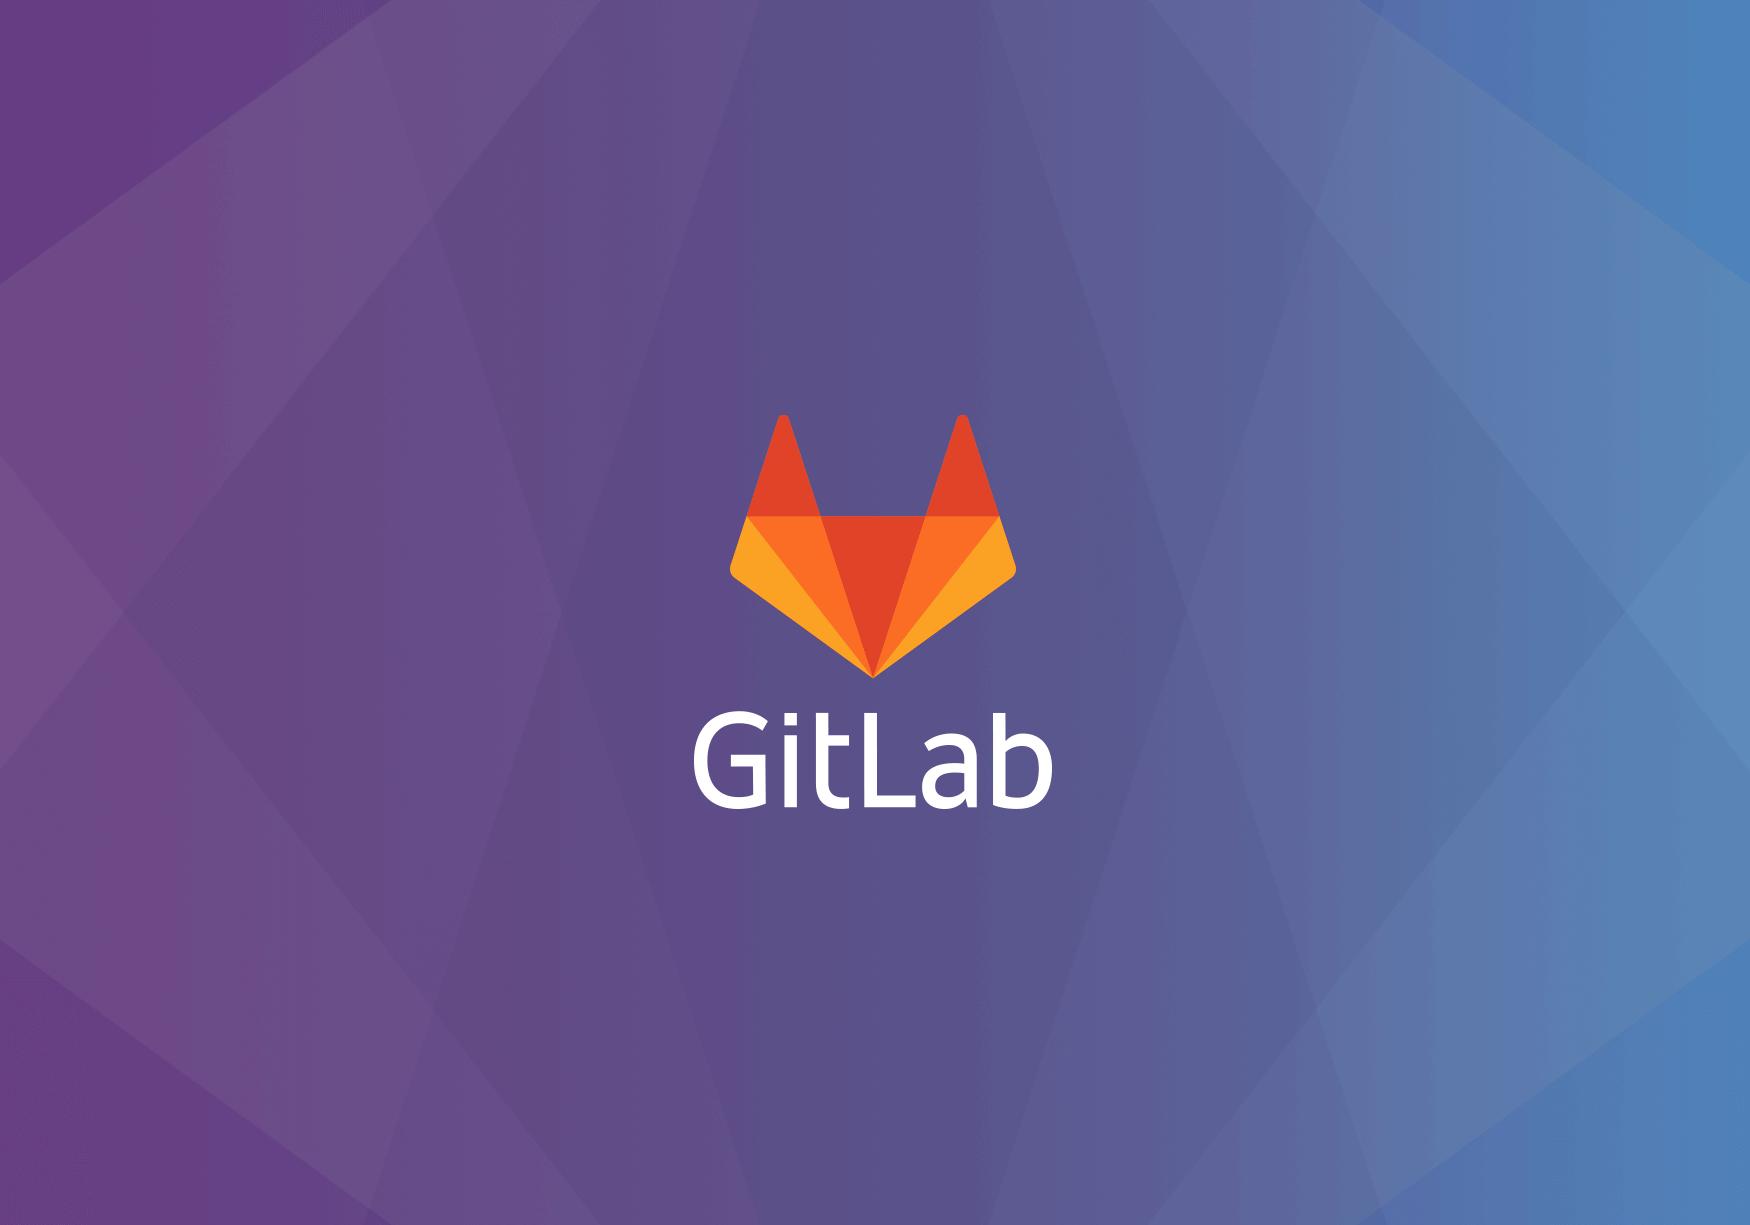 Triggering a build Pipeline in GitLab from spinnaker